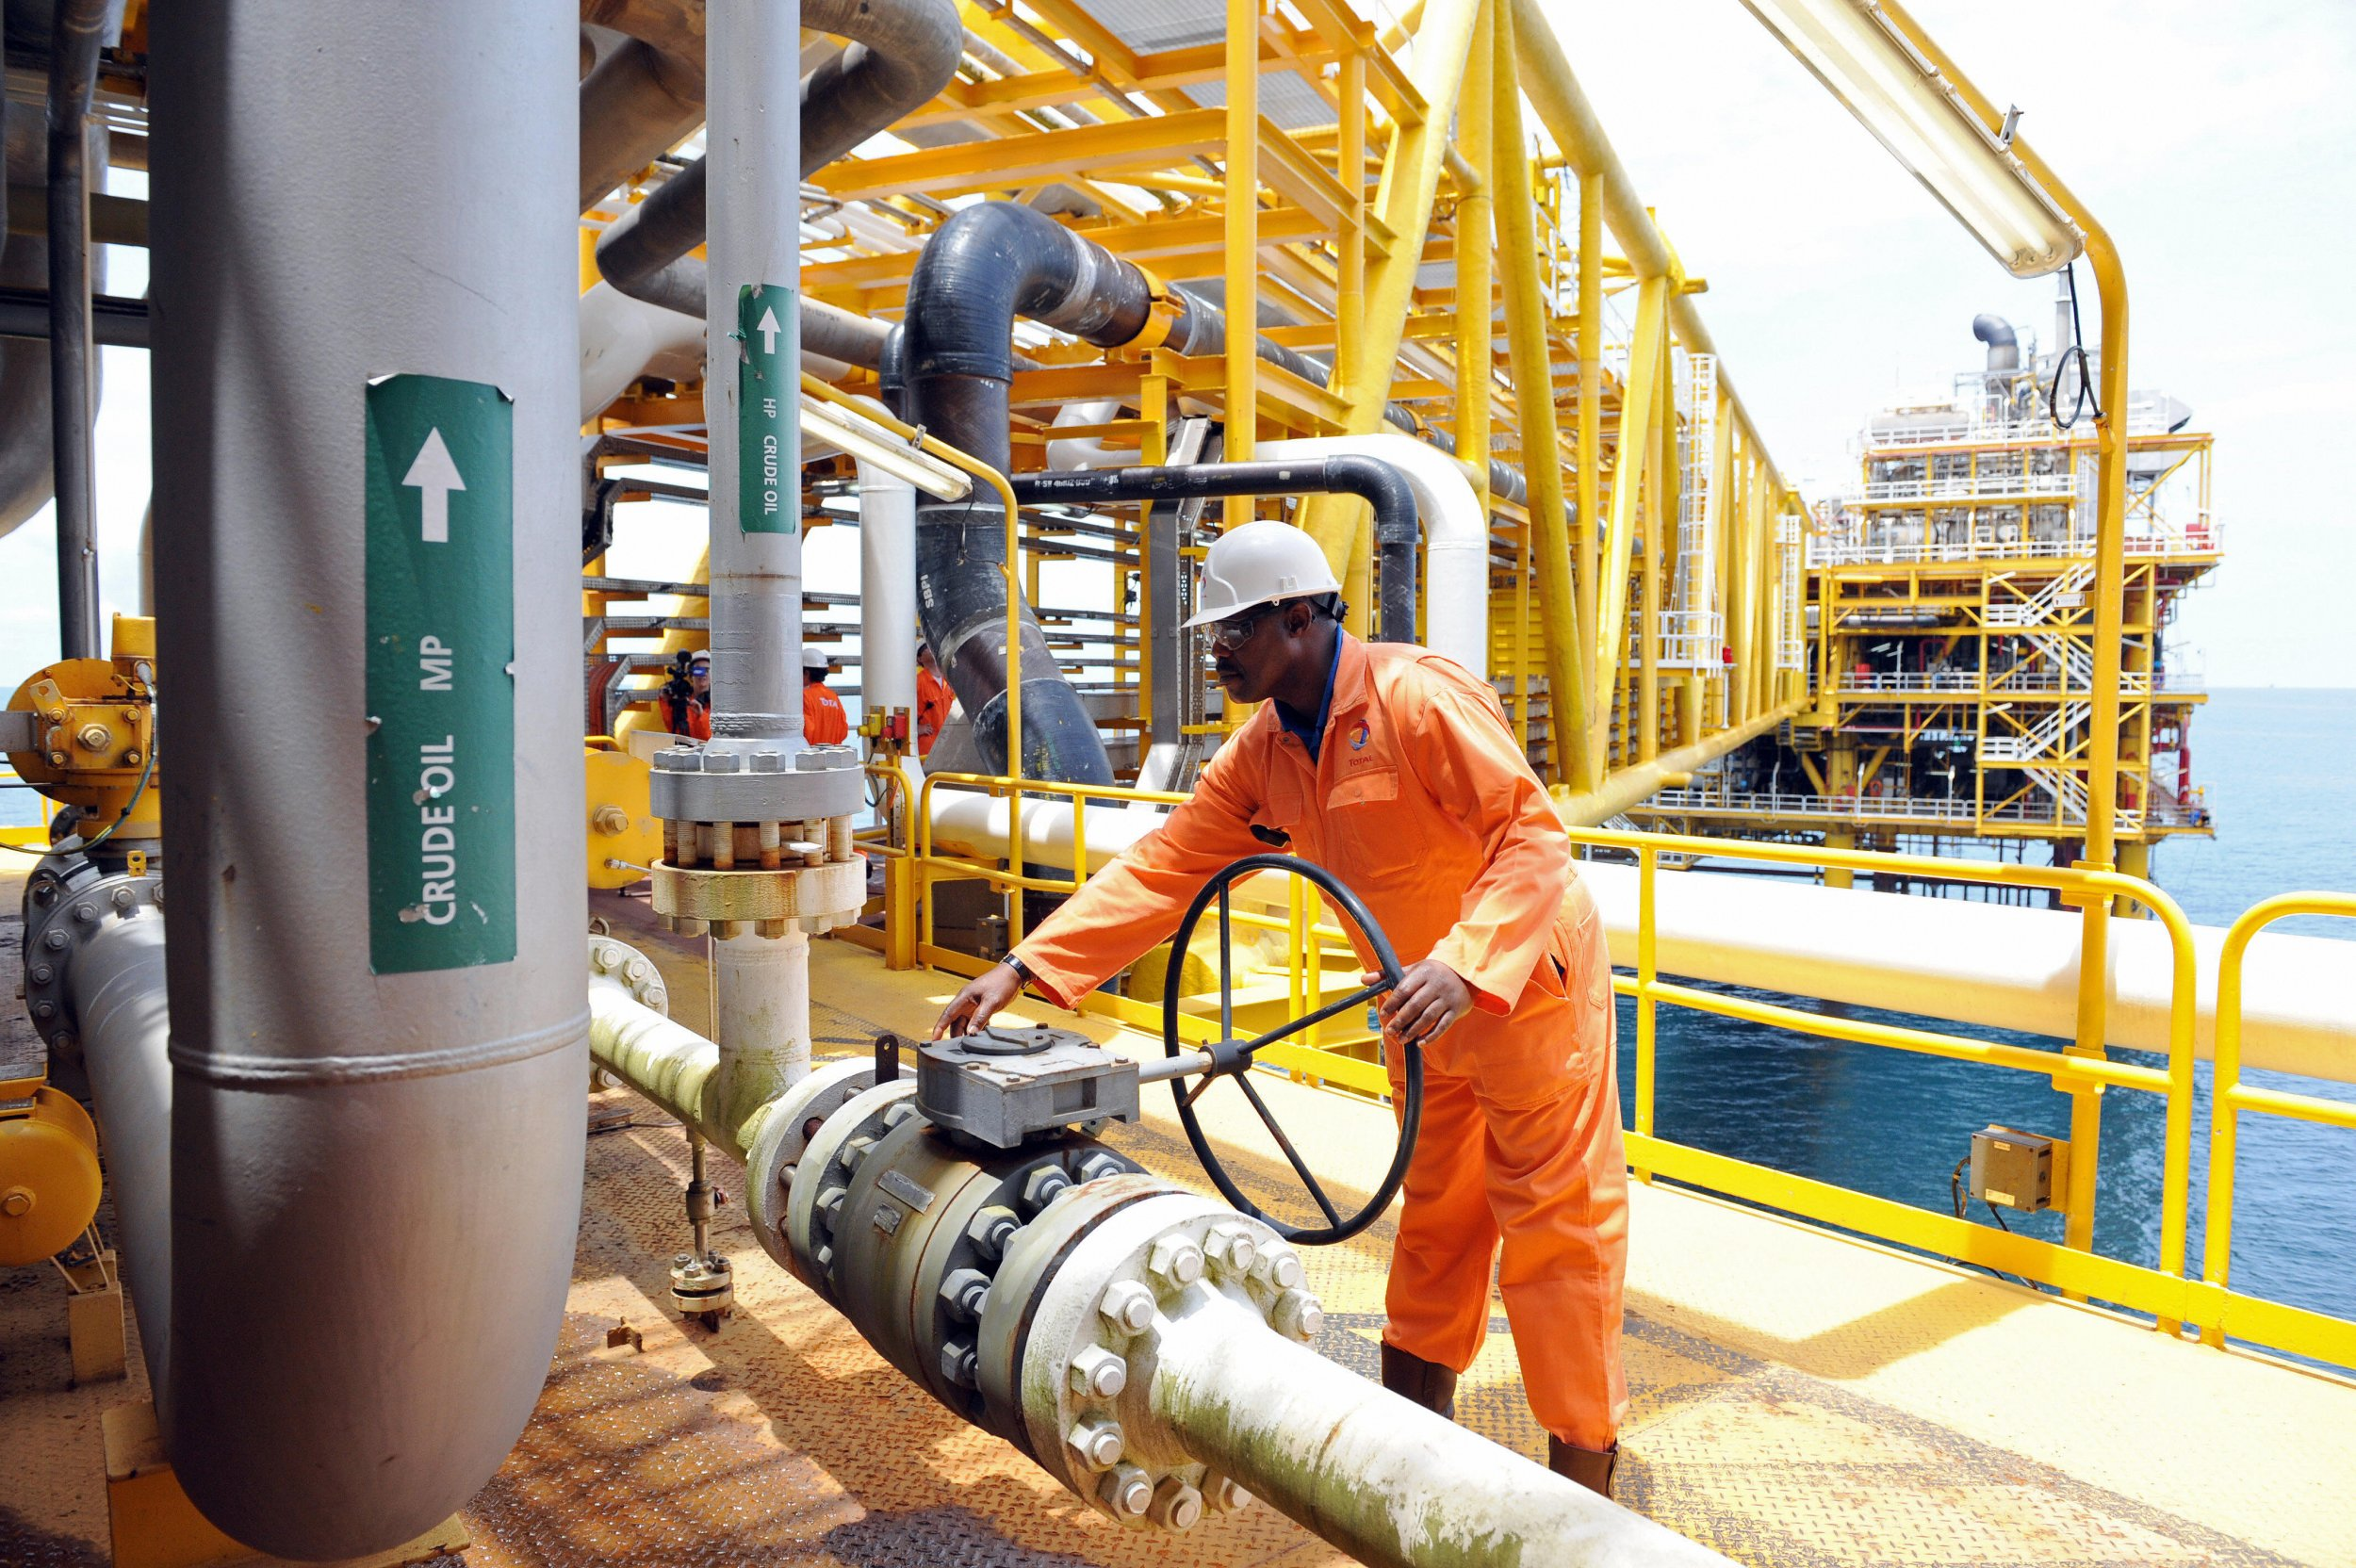 http://s.newsweek.com/sites/www.newsweek.com/files/2016/03/09/oil-worker-platform-port-harcourt-nigeria..jpg